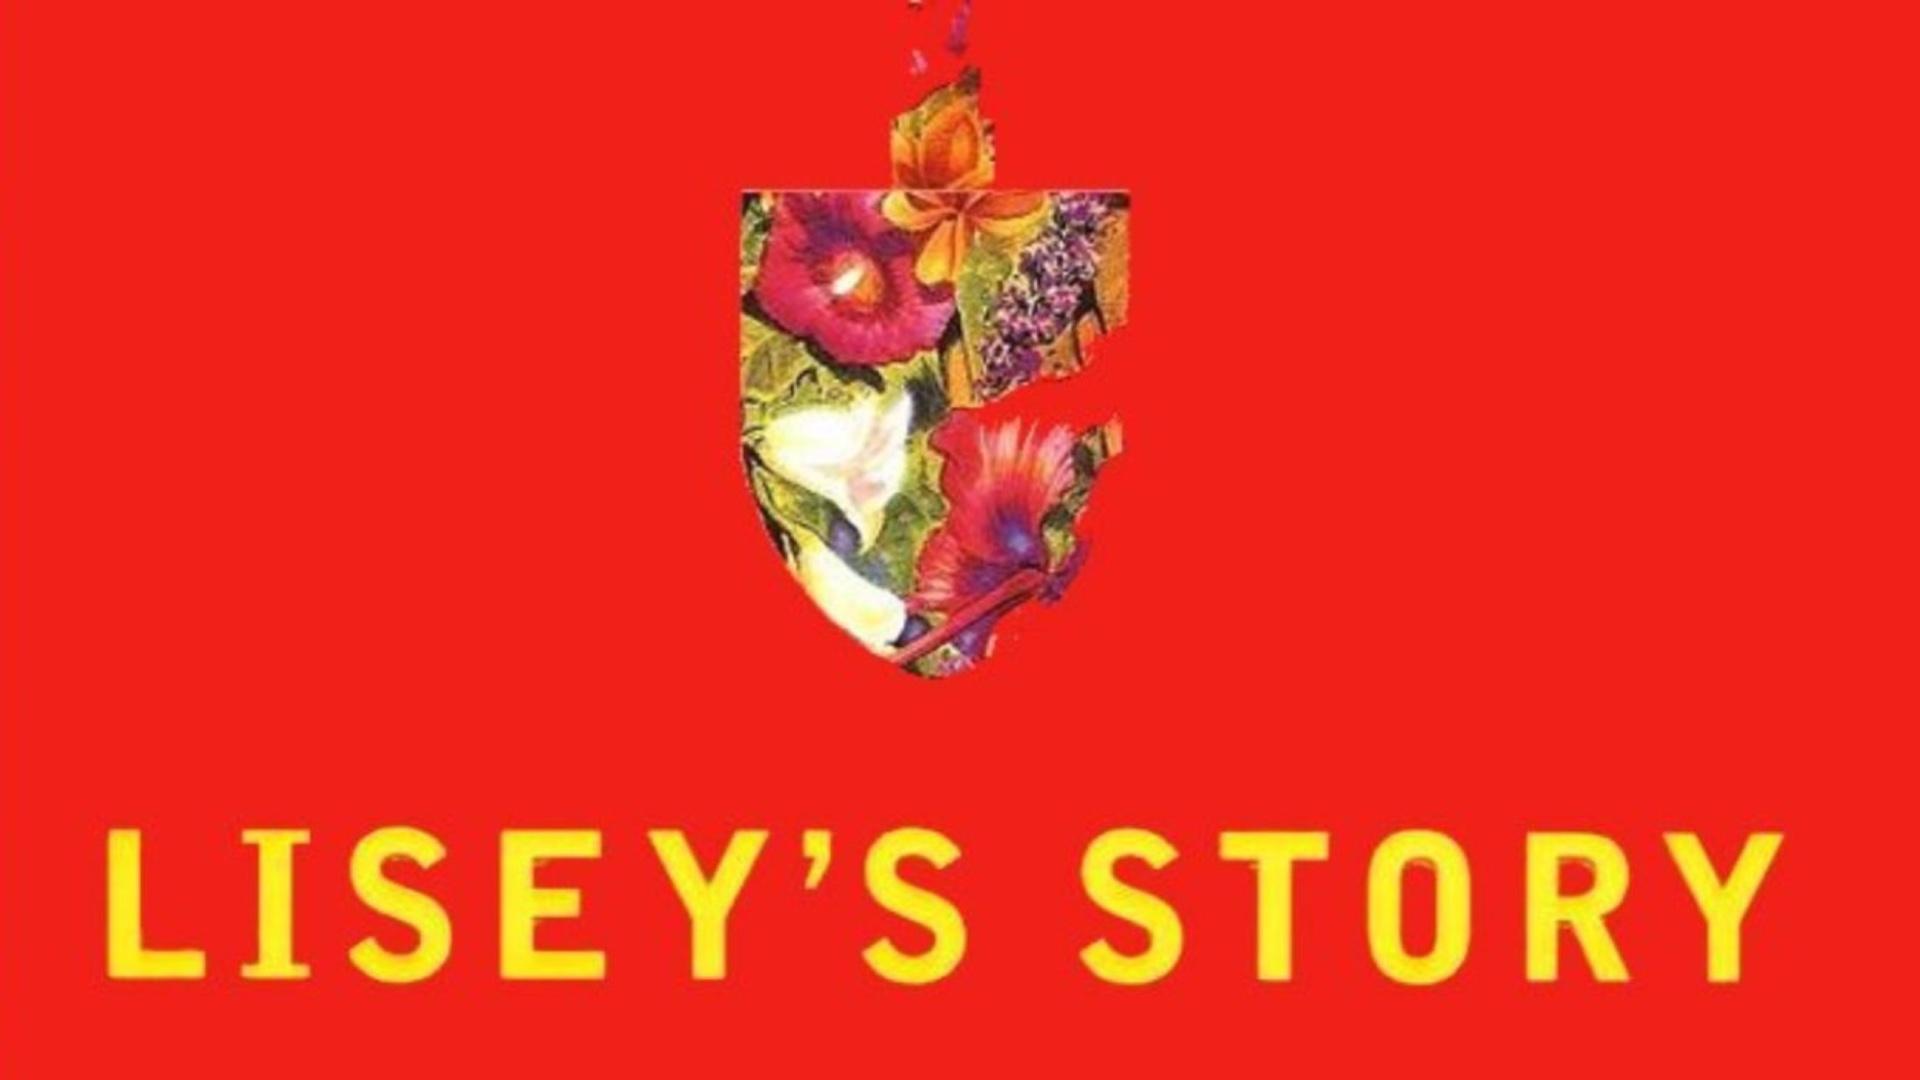 the-series-adaptation-of-stephen-kings-liseys-story-lands-a-director-social.jpg